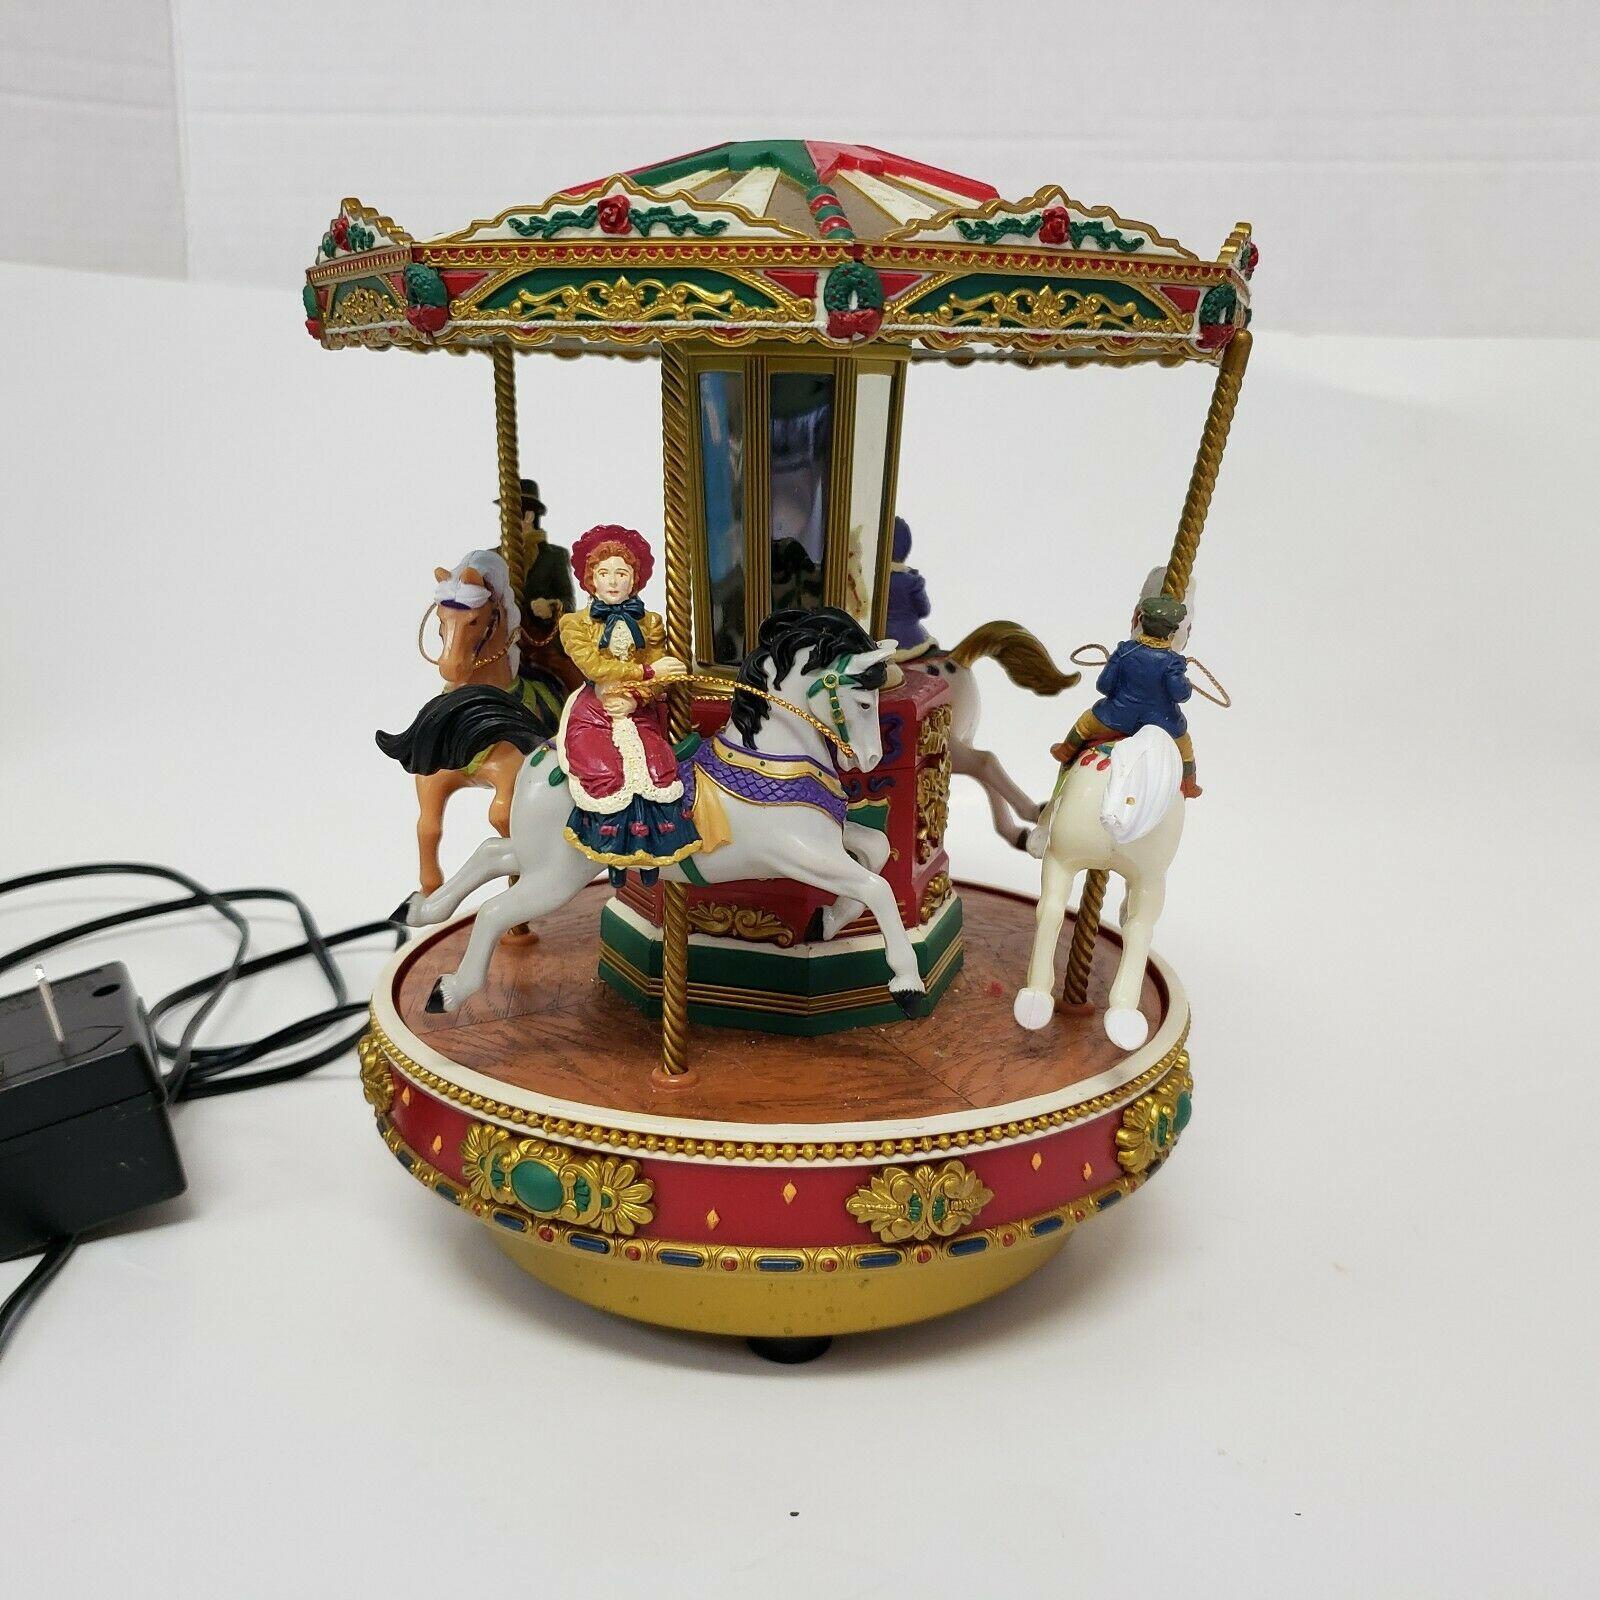 Mr. Christmas Christmas Go Round Musical Carousel #29107 vintage 1997 - $24.99